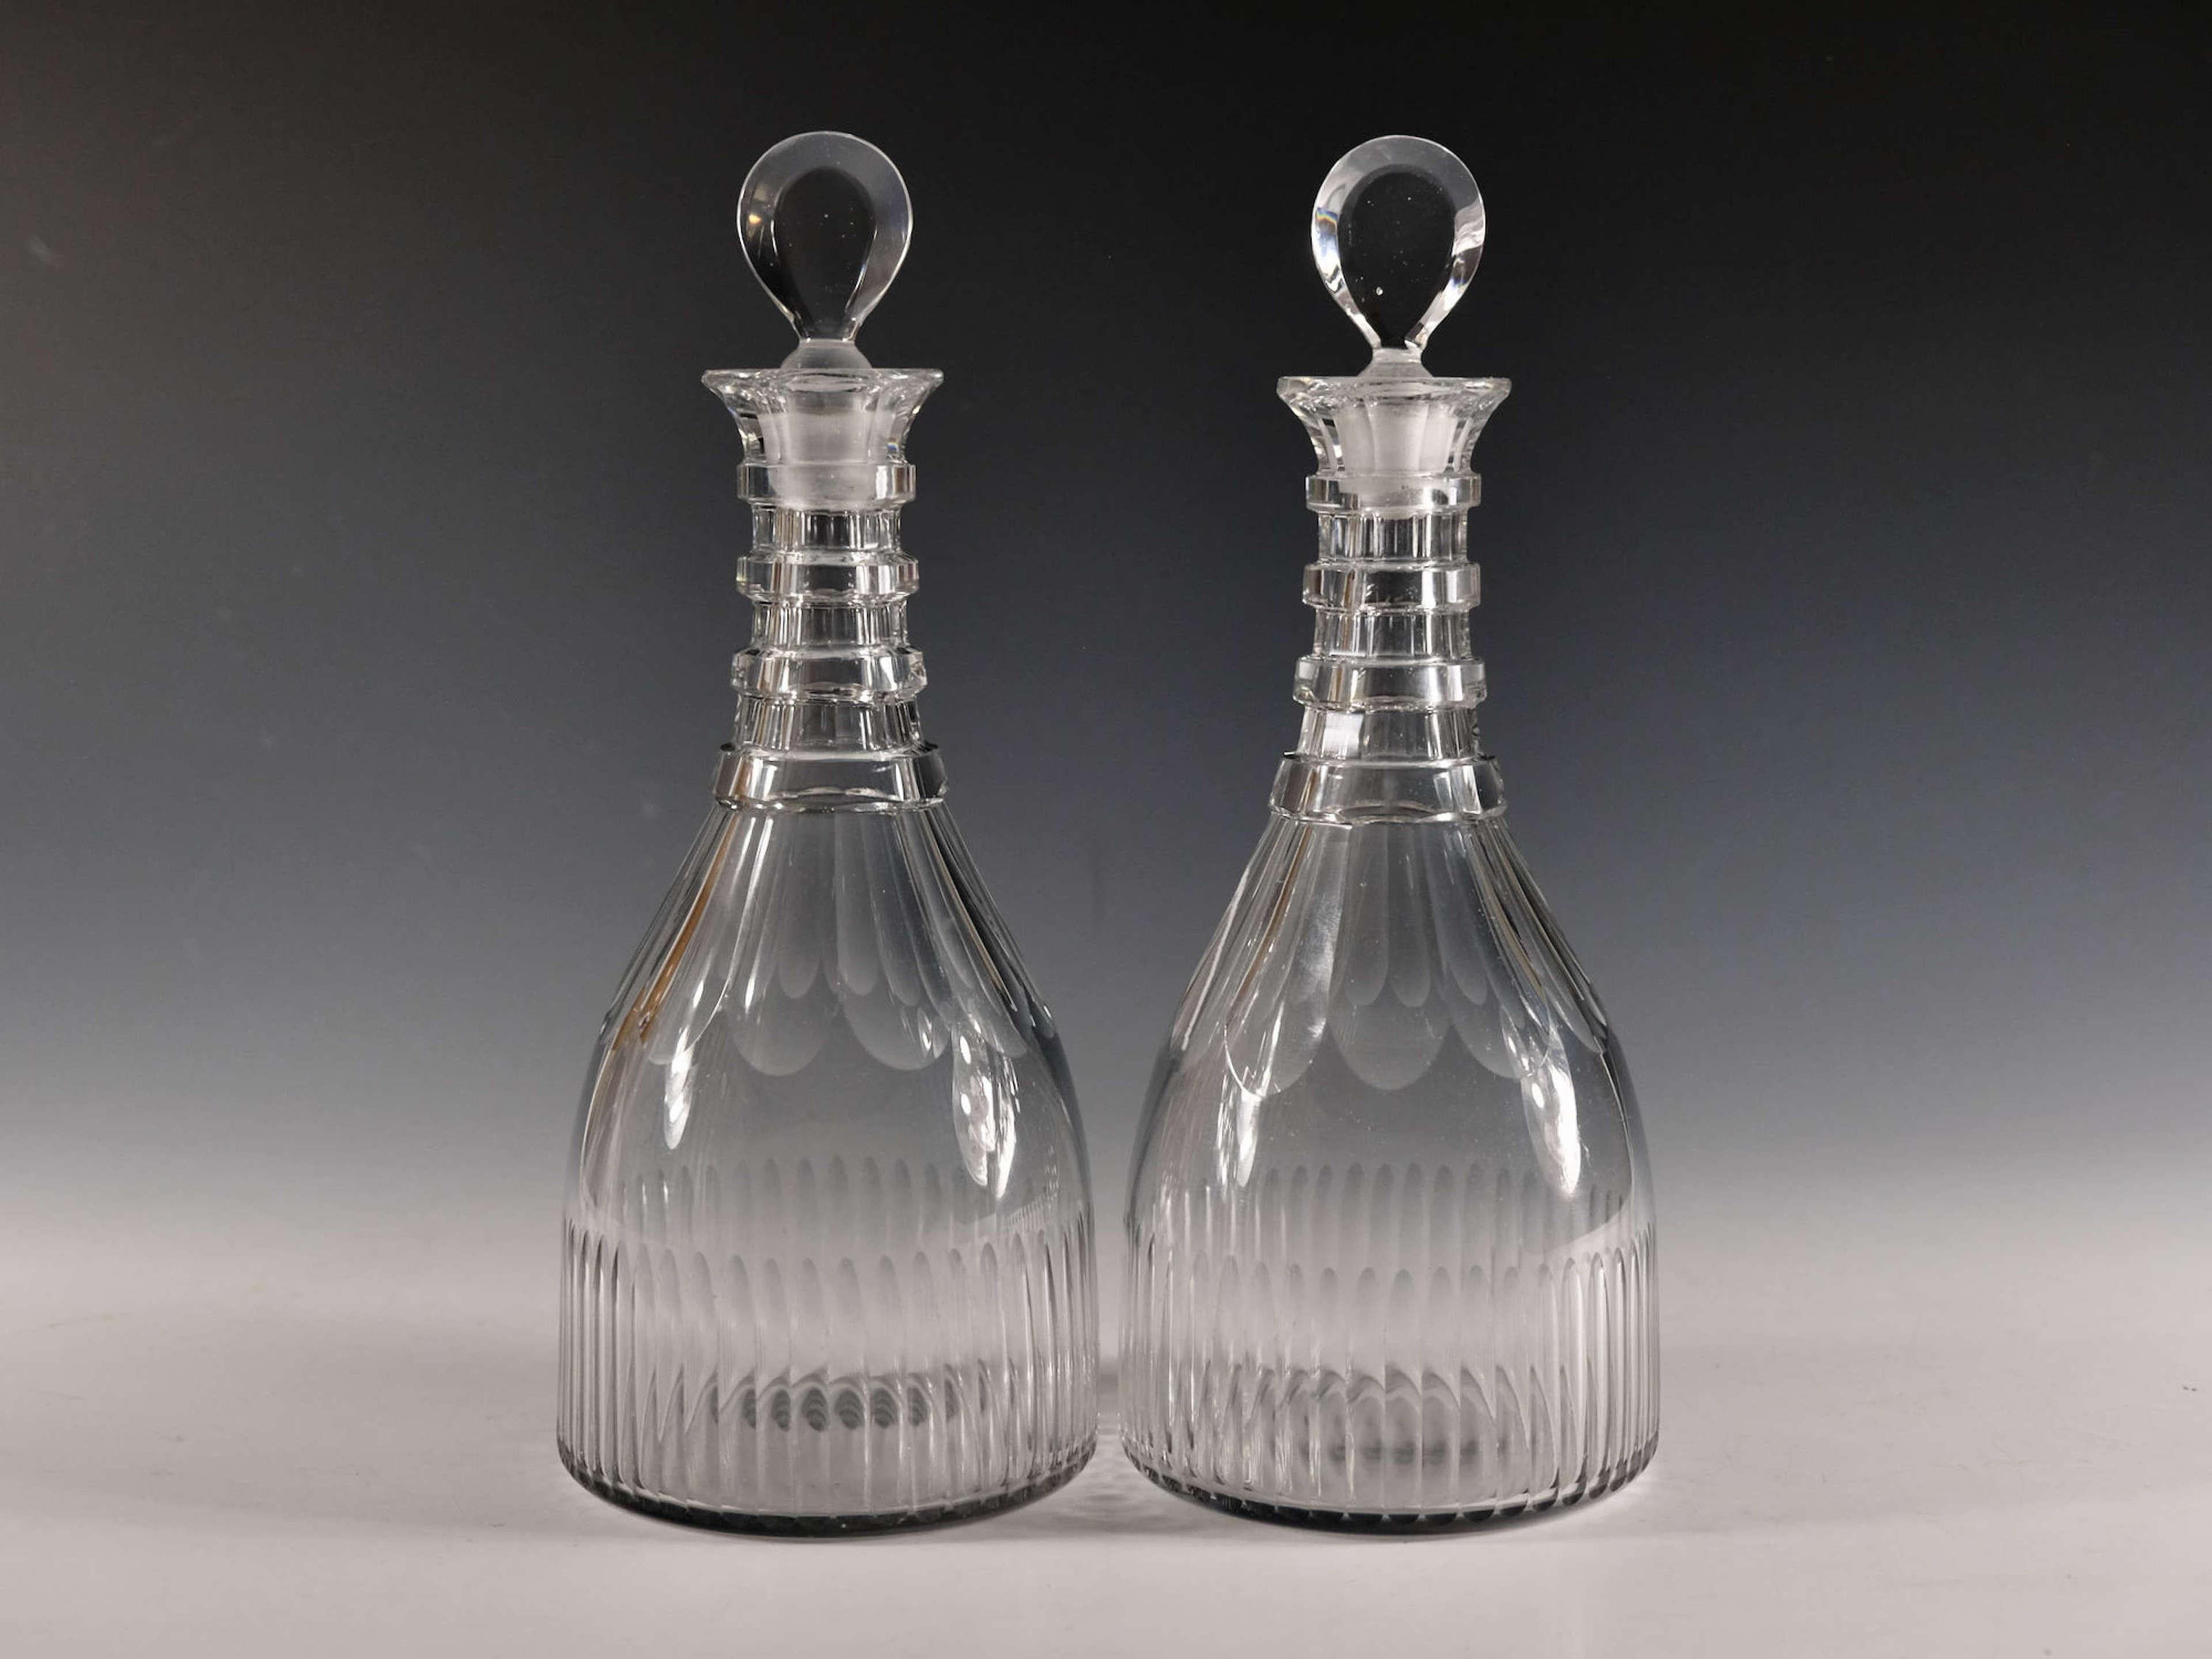 Antique glass pair of decanter English c1810